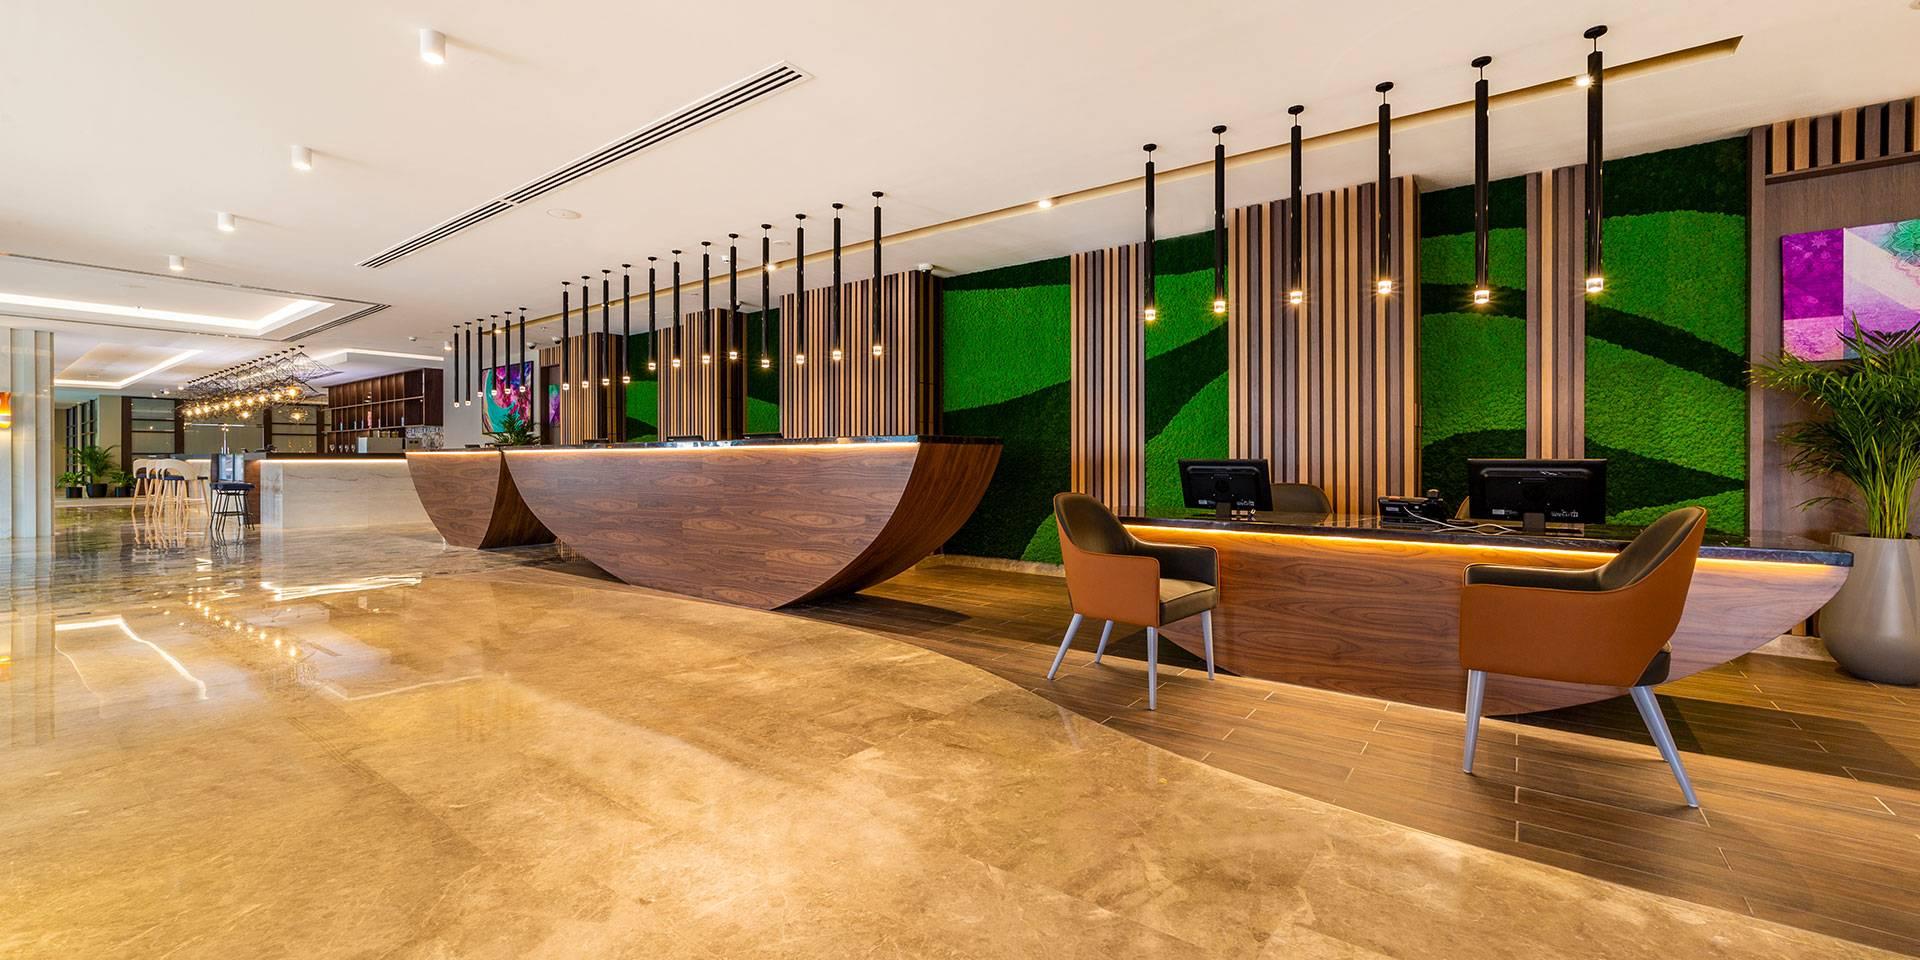 Mercure Hotel Apartments Barsha Heights